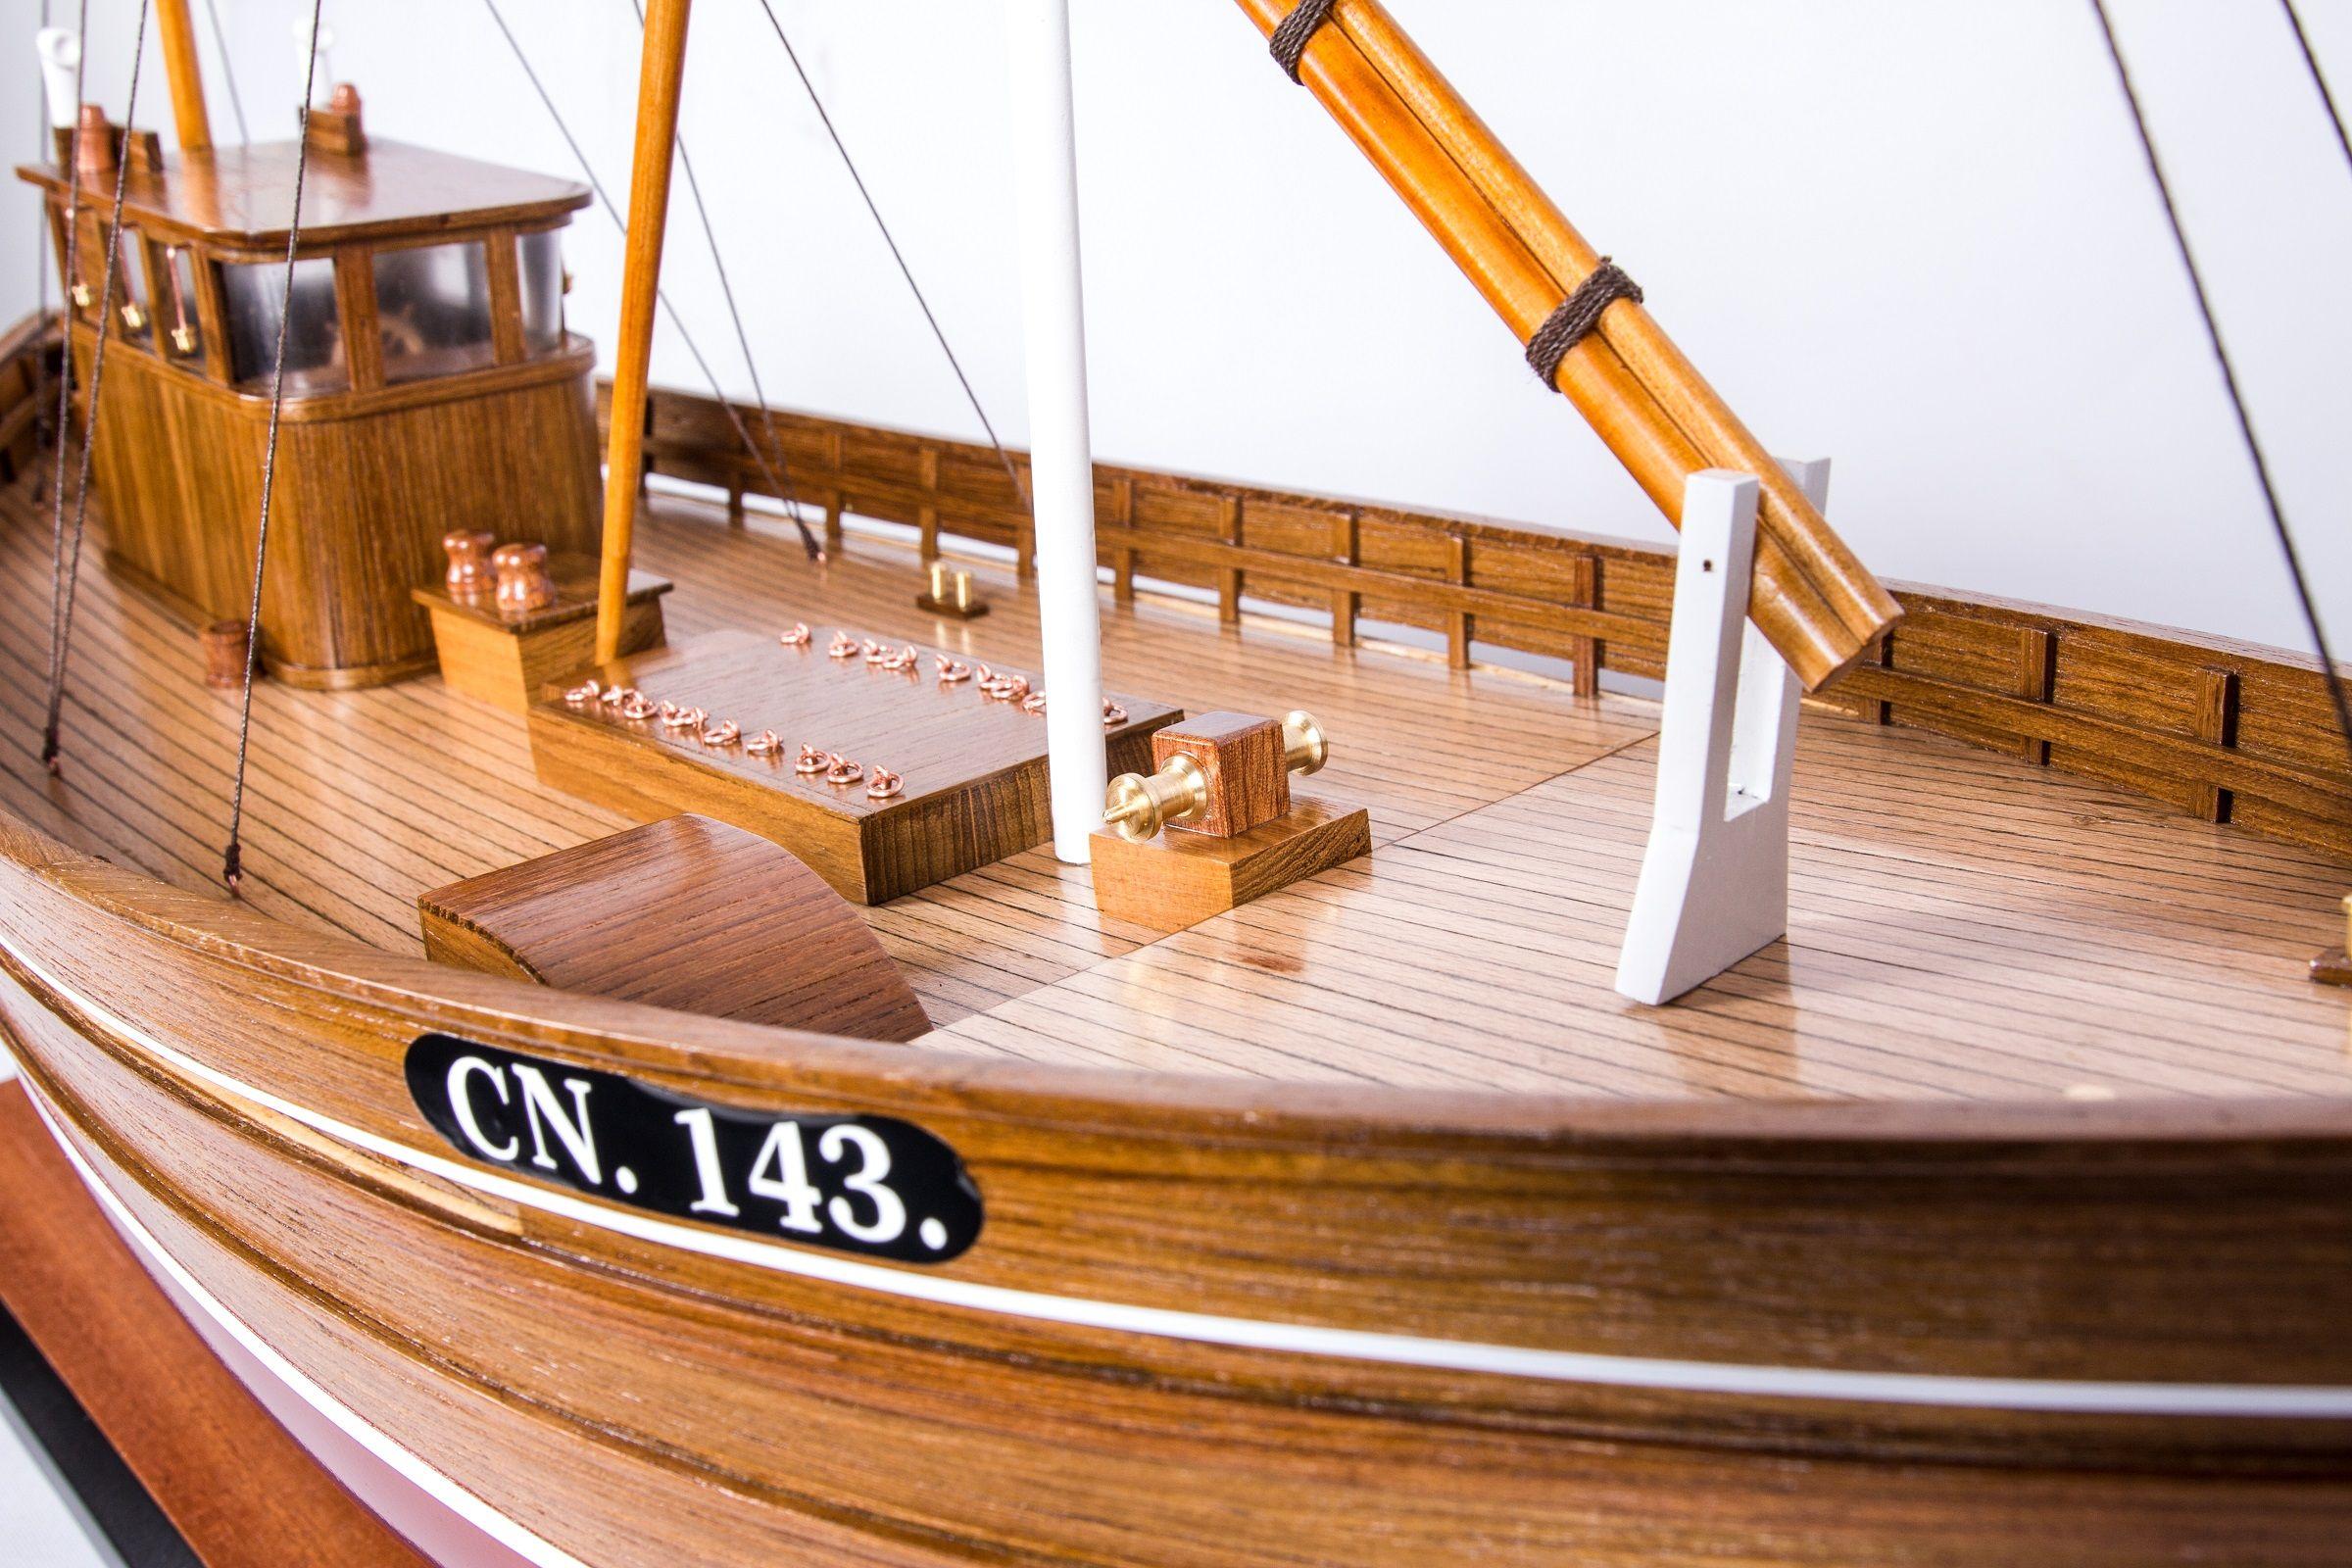 Amalthea CN 143 Model Boat